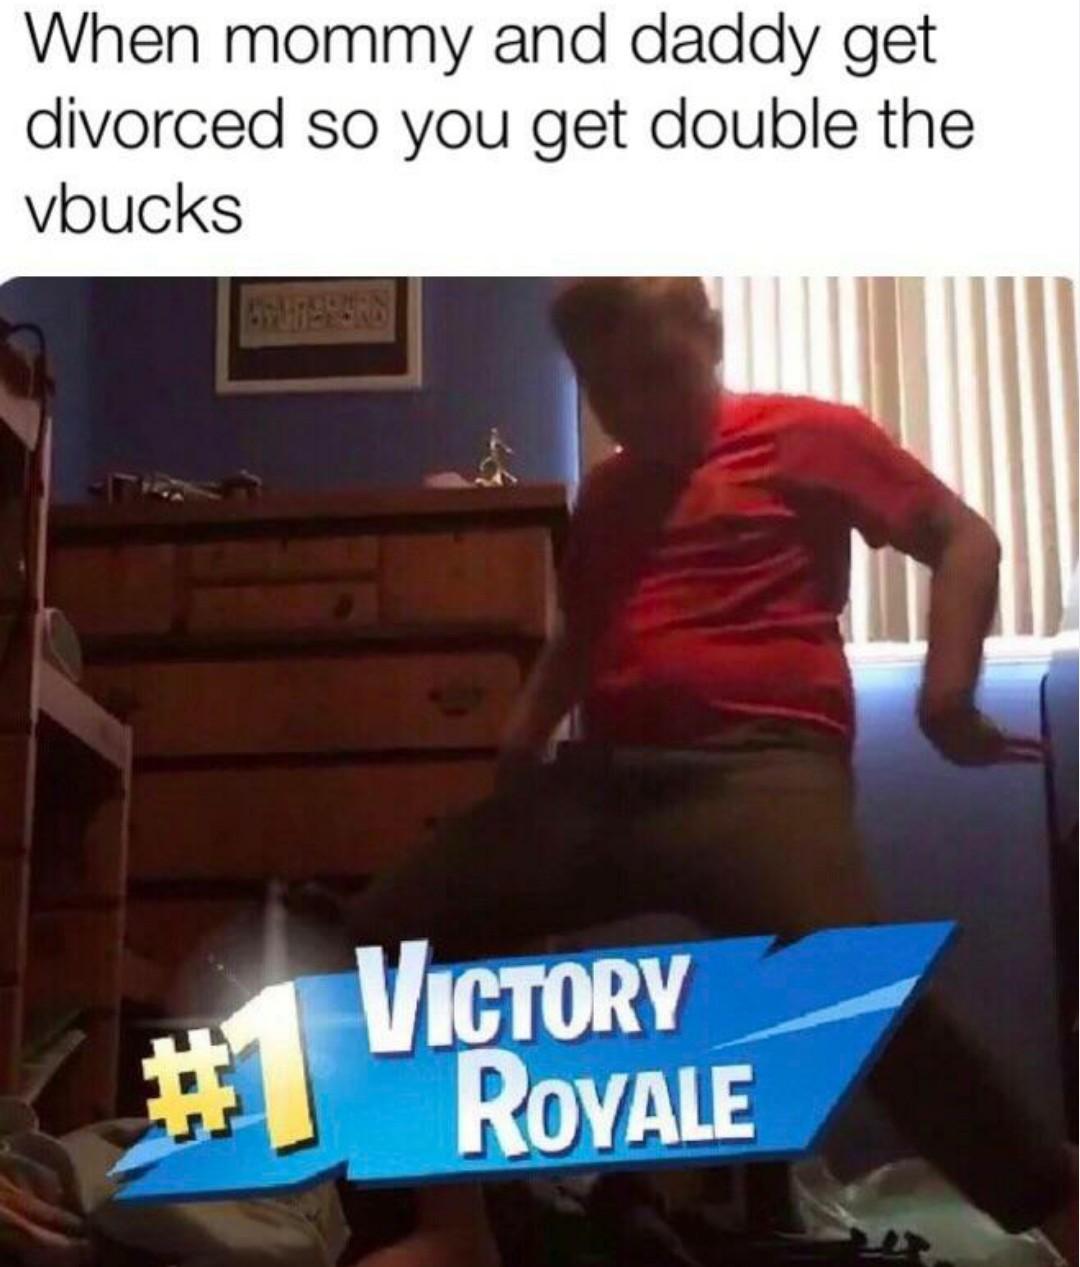 Epic victory royale - meme